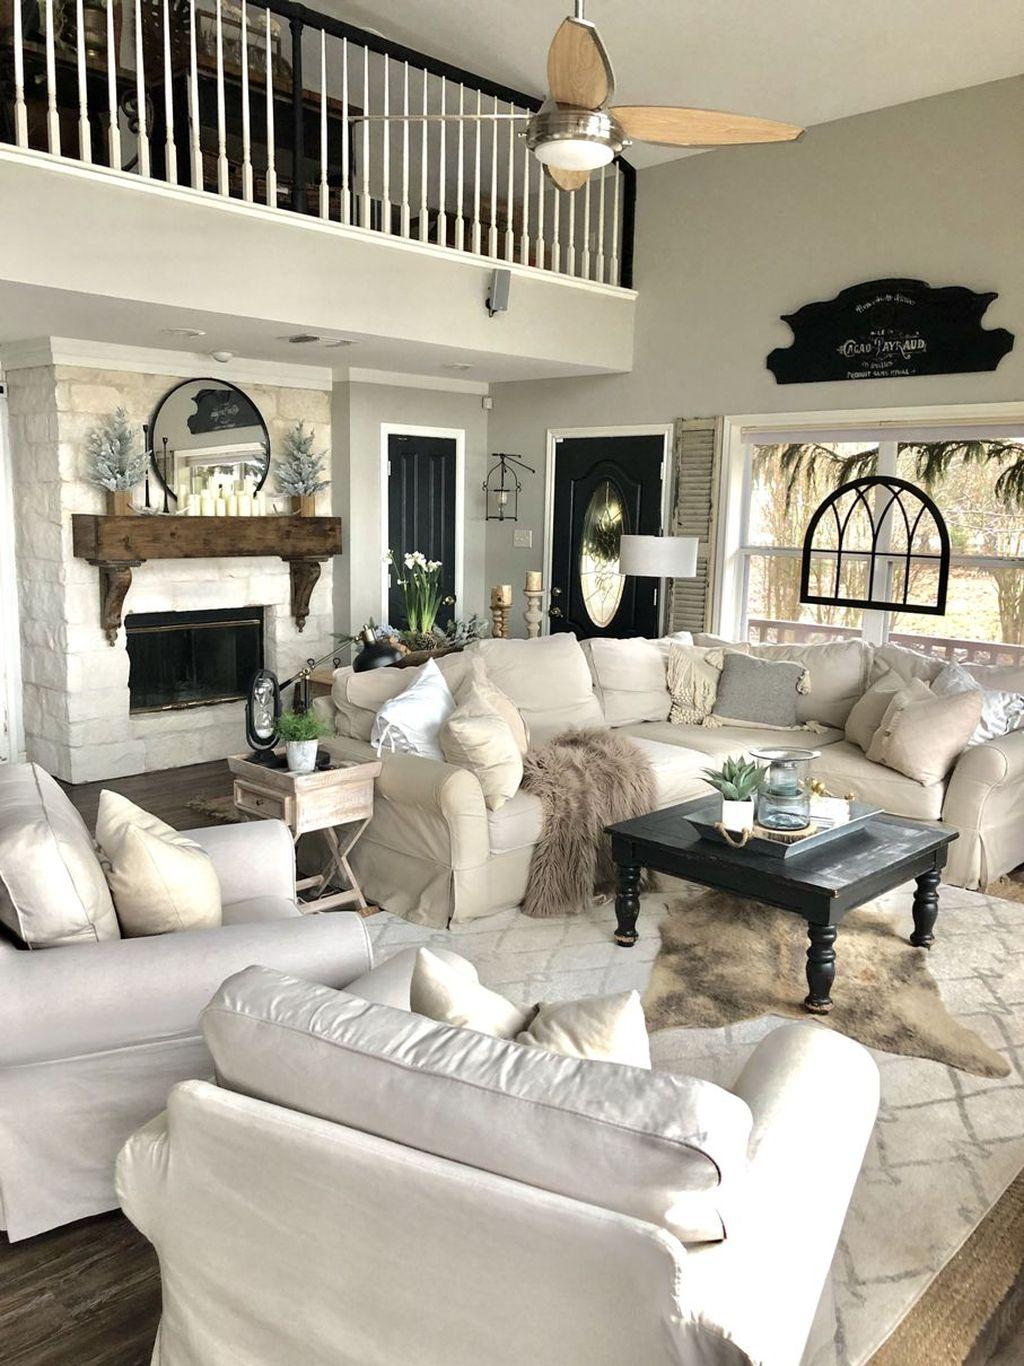 Enchanting Living Room Decor Ideas That Trending This Winter 15